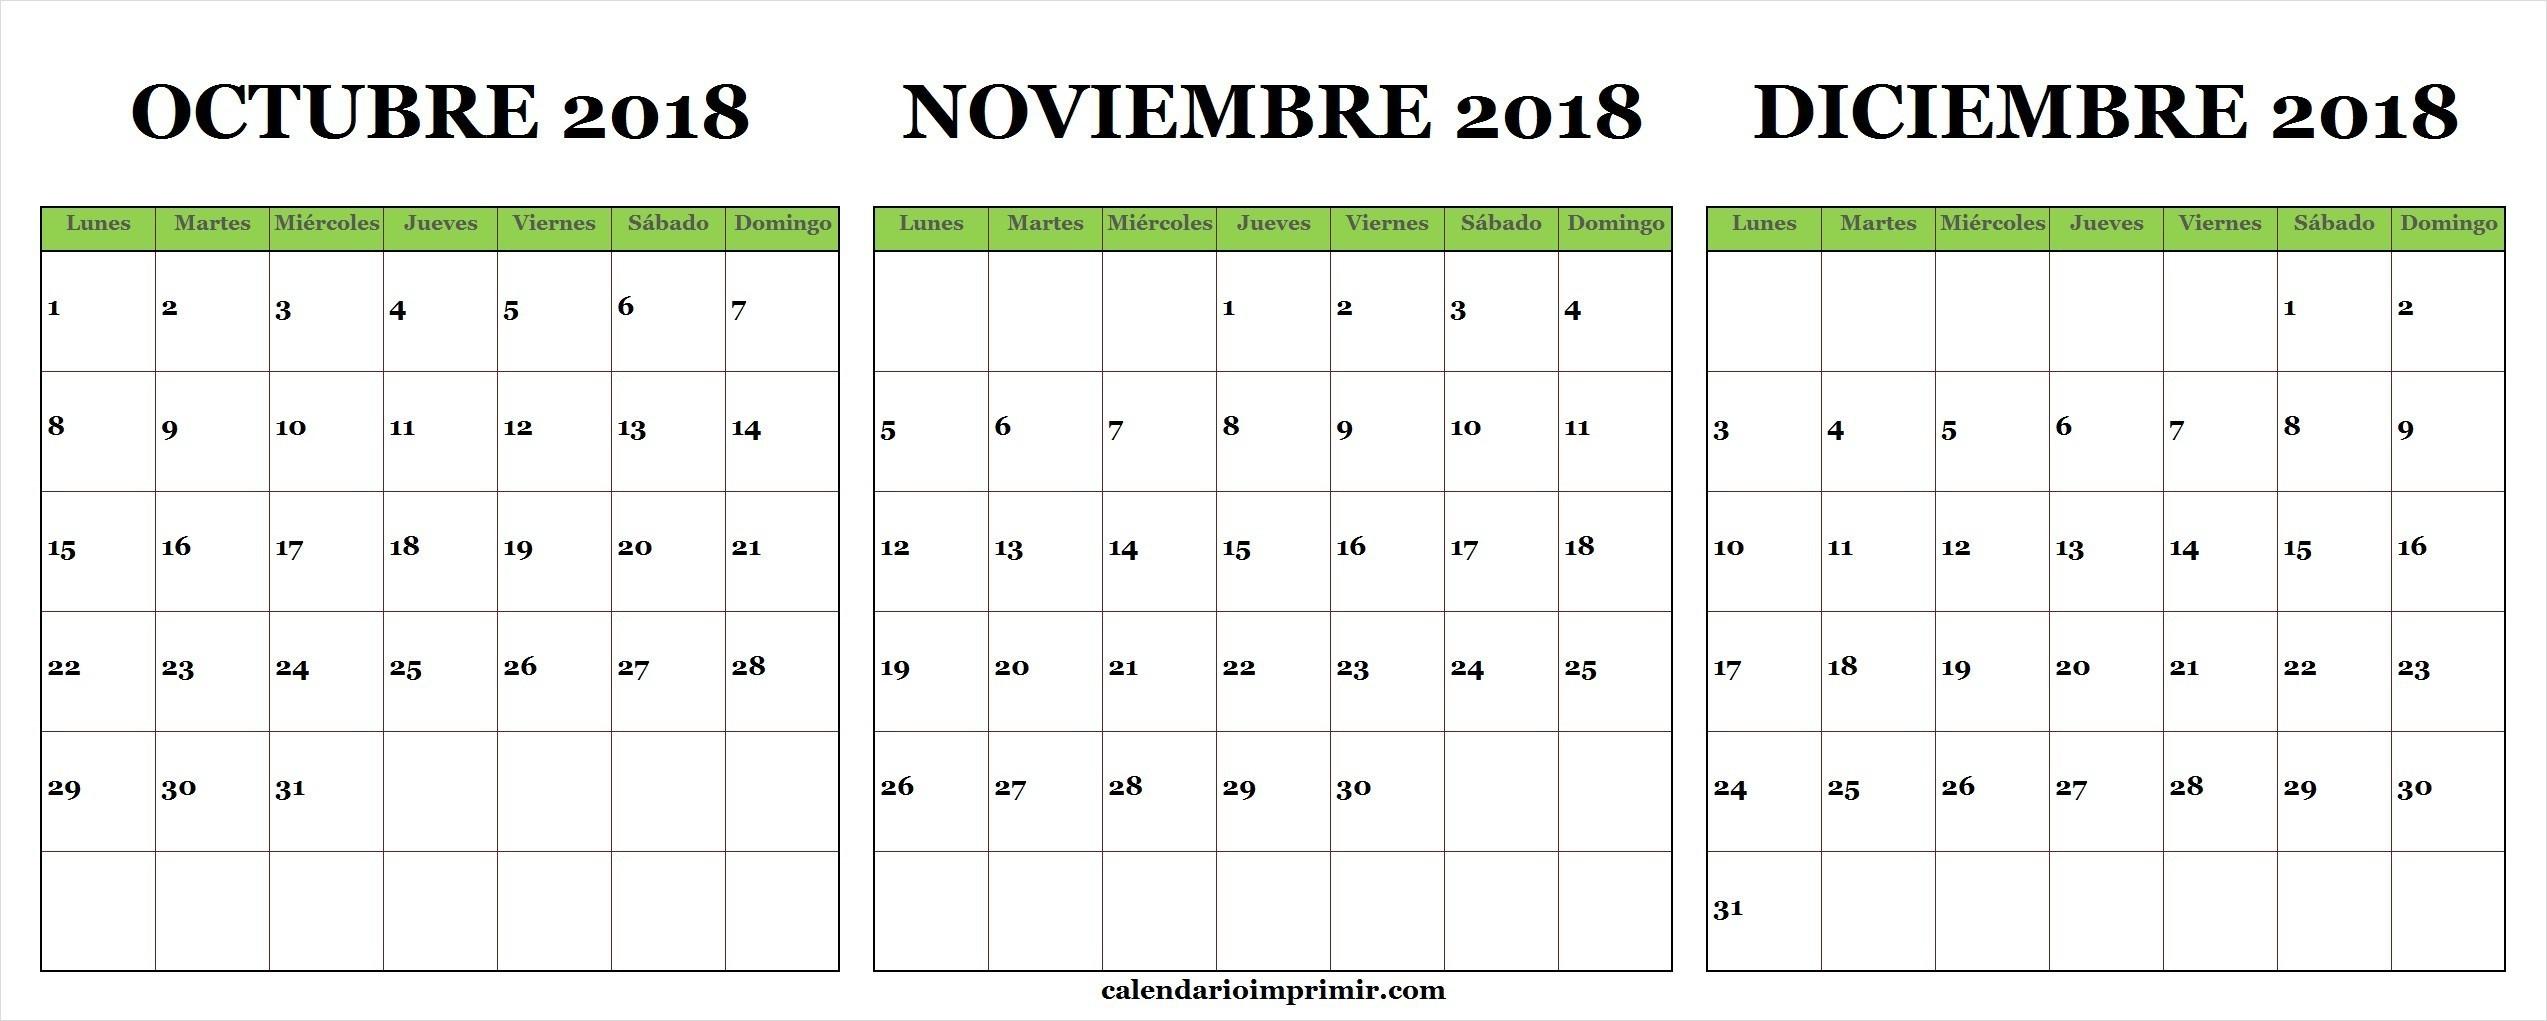 Imprimir Calendario Agosto Septiembre Octubre Noviembre Diciembre 2018 Enero 2019 Chile Calendario De Octubre Noviembre Diciembre